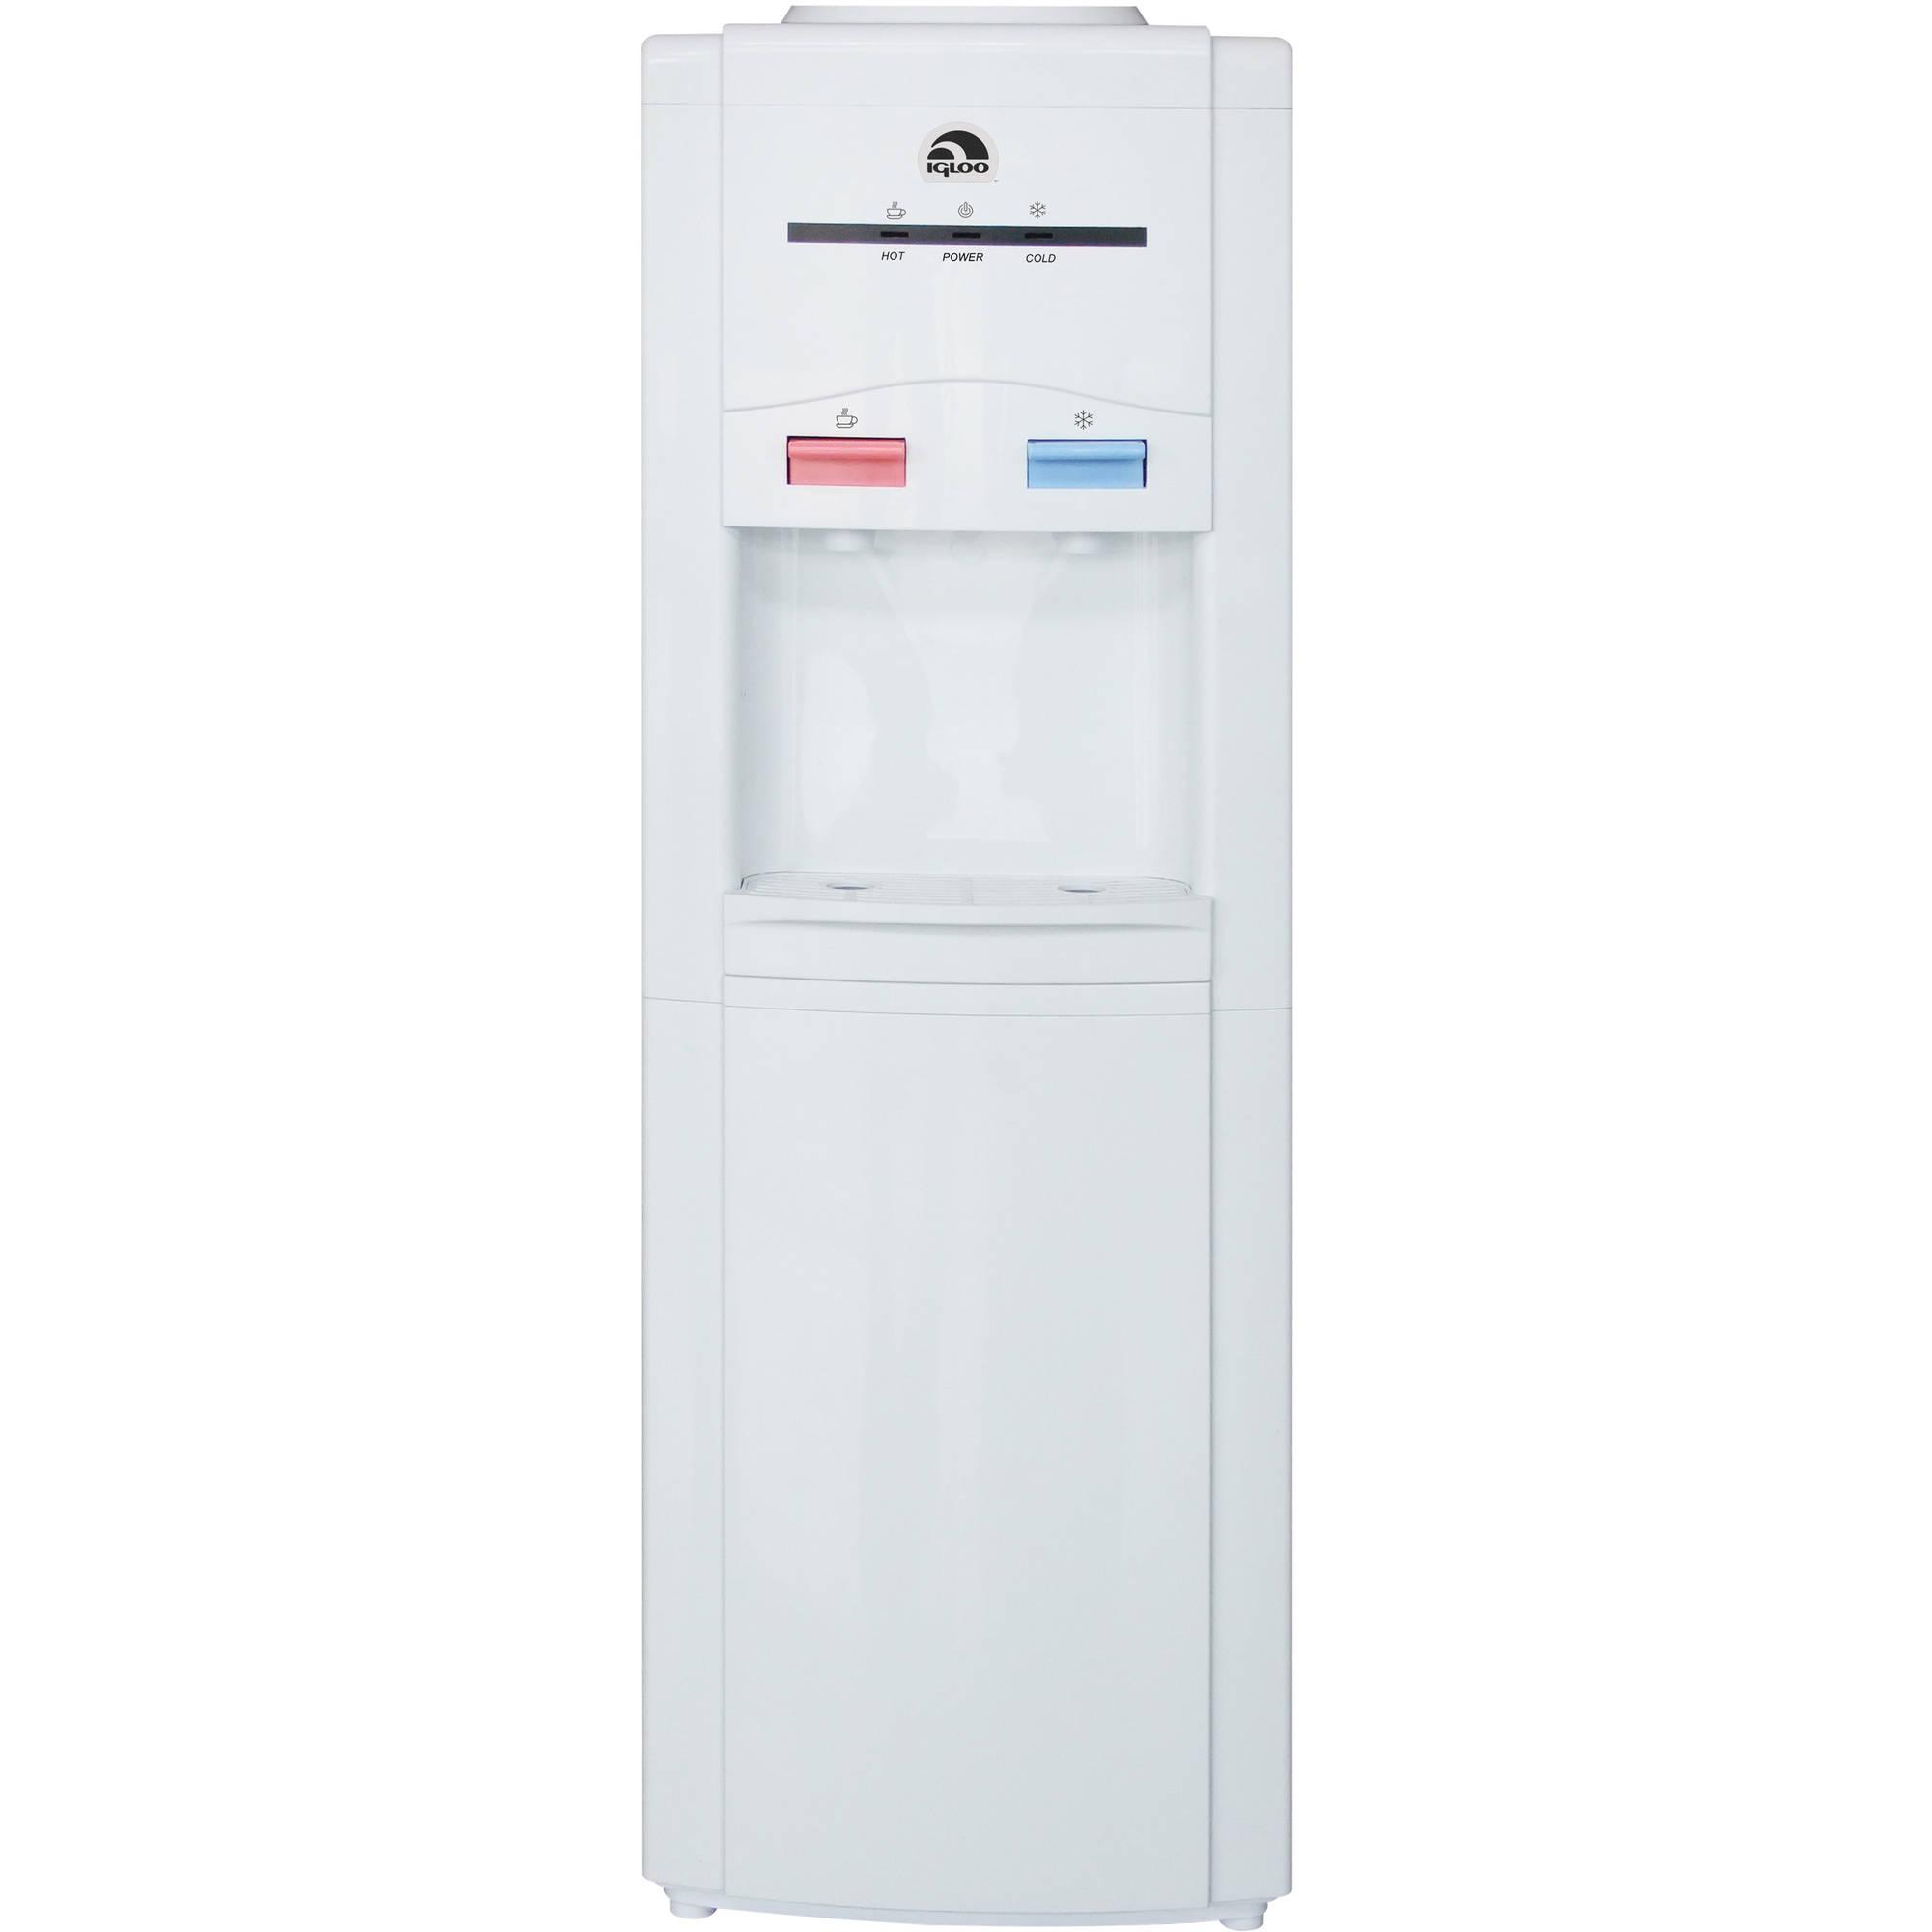 Igloo Water Cooler/Dispenser, White